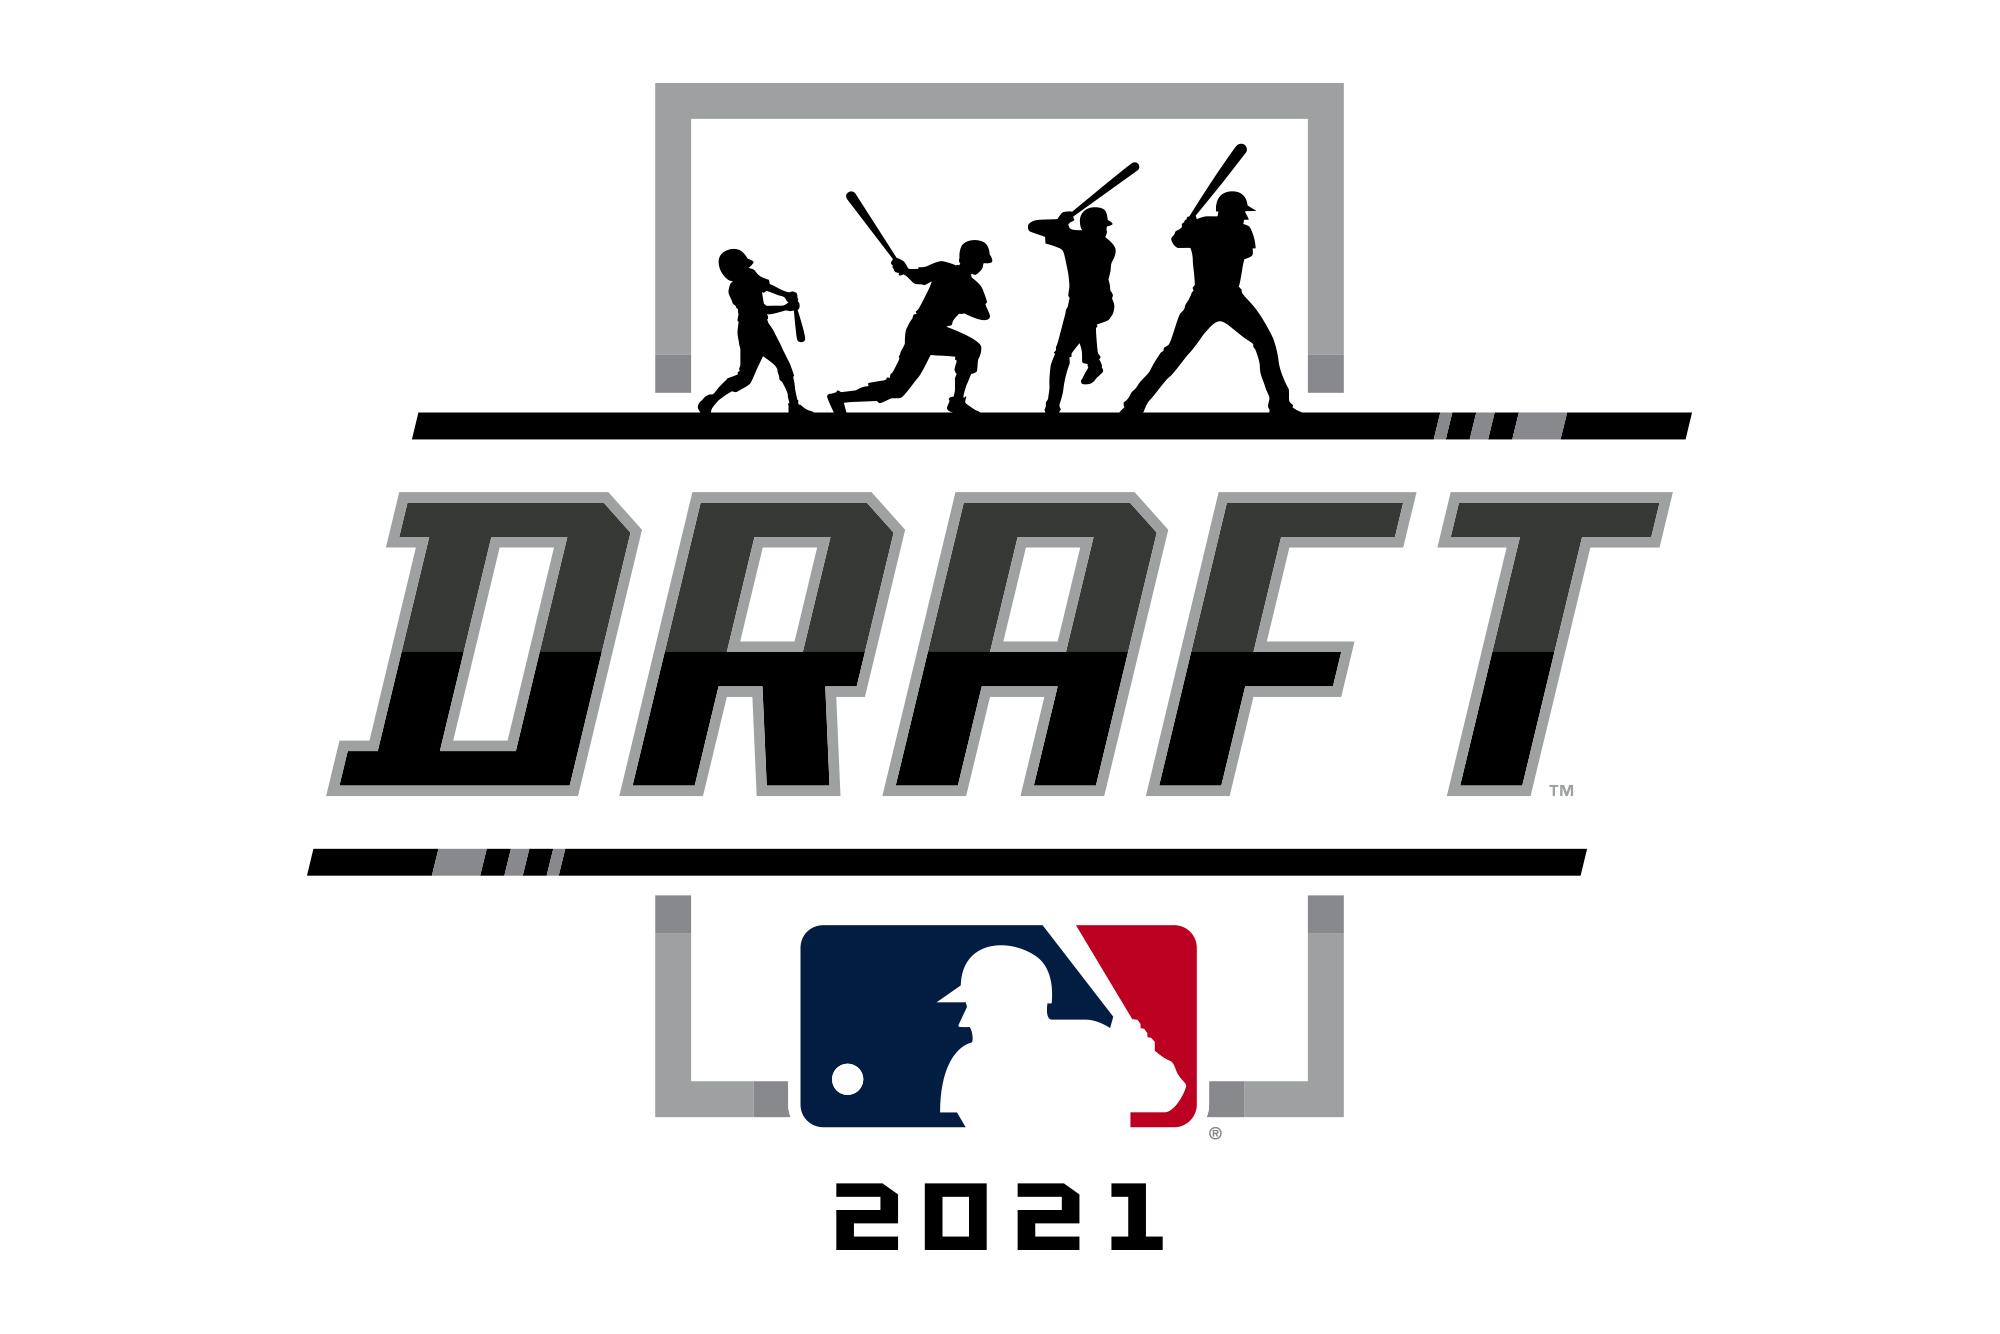 2021 MLB Draft Logo